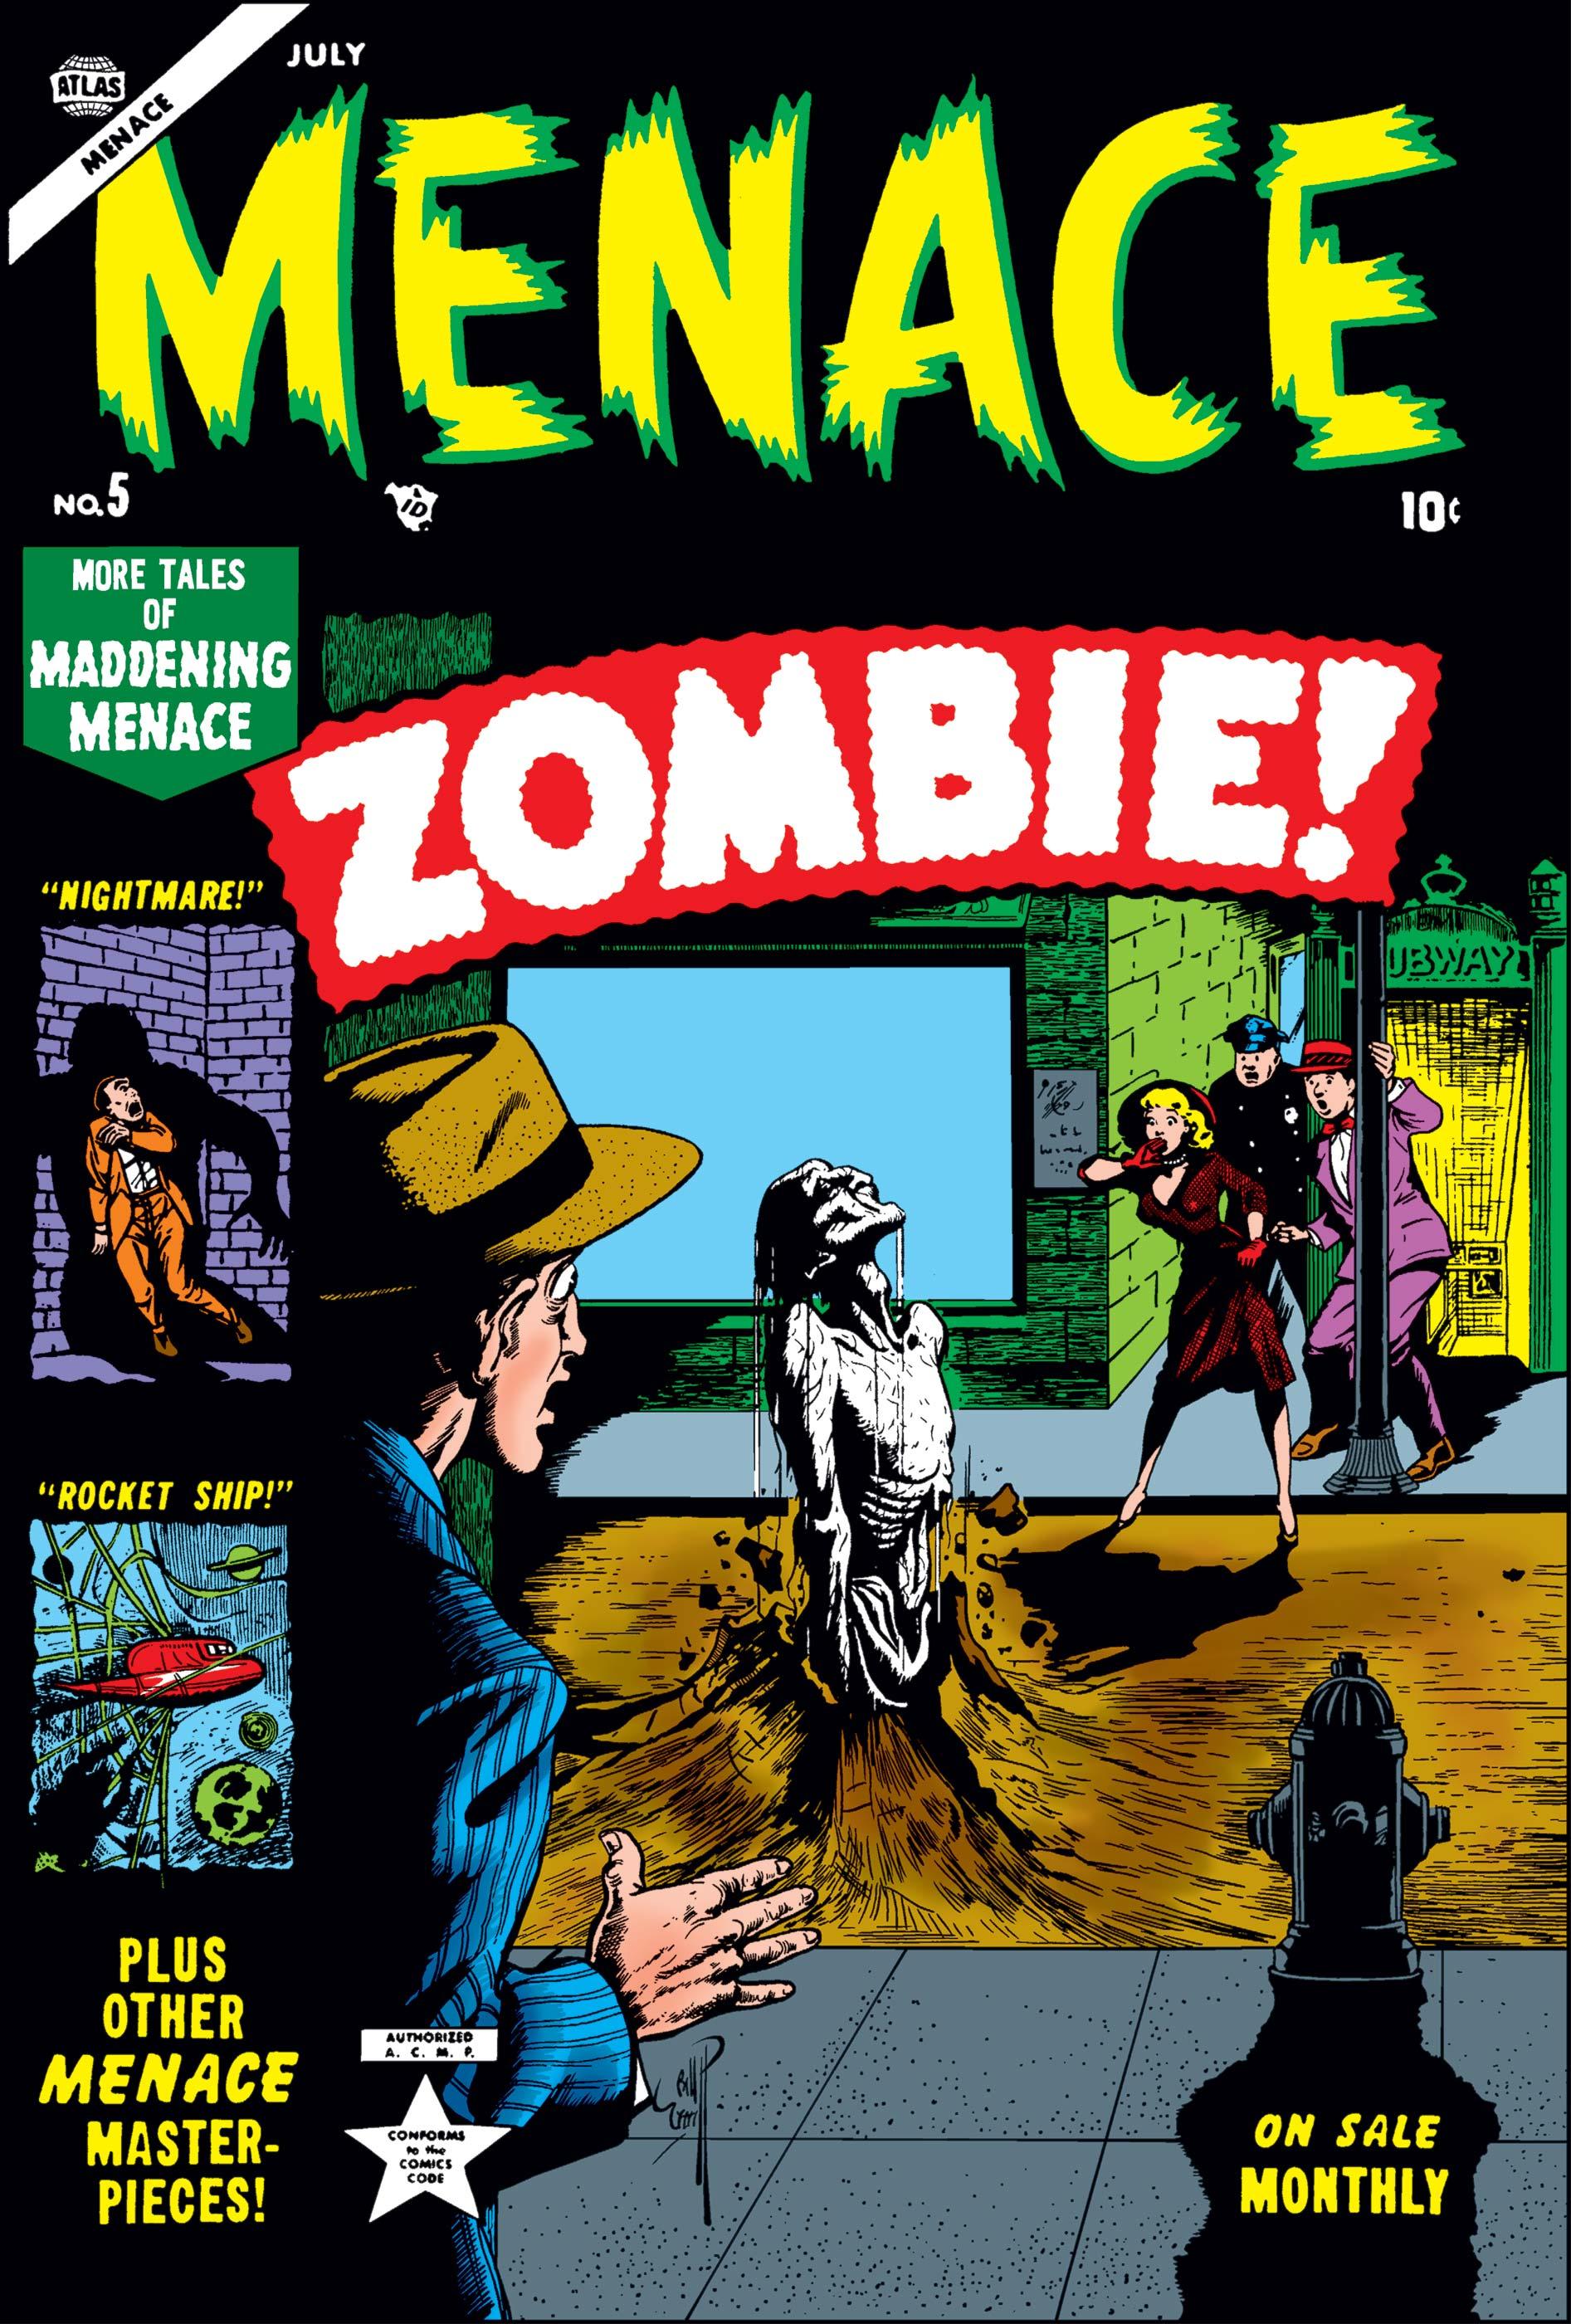 Menace (1953) #5